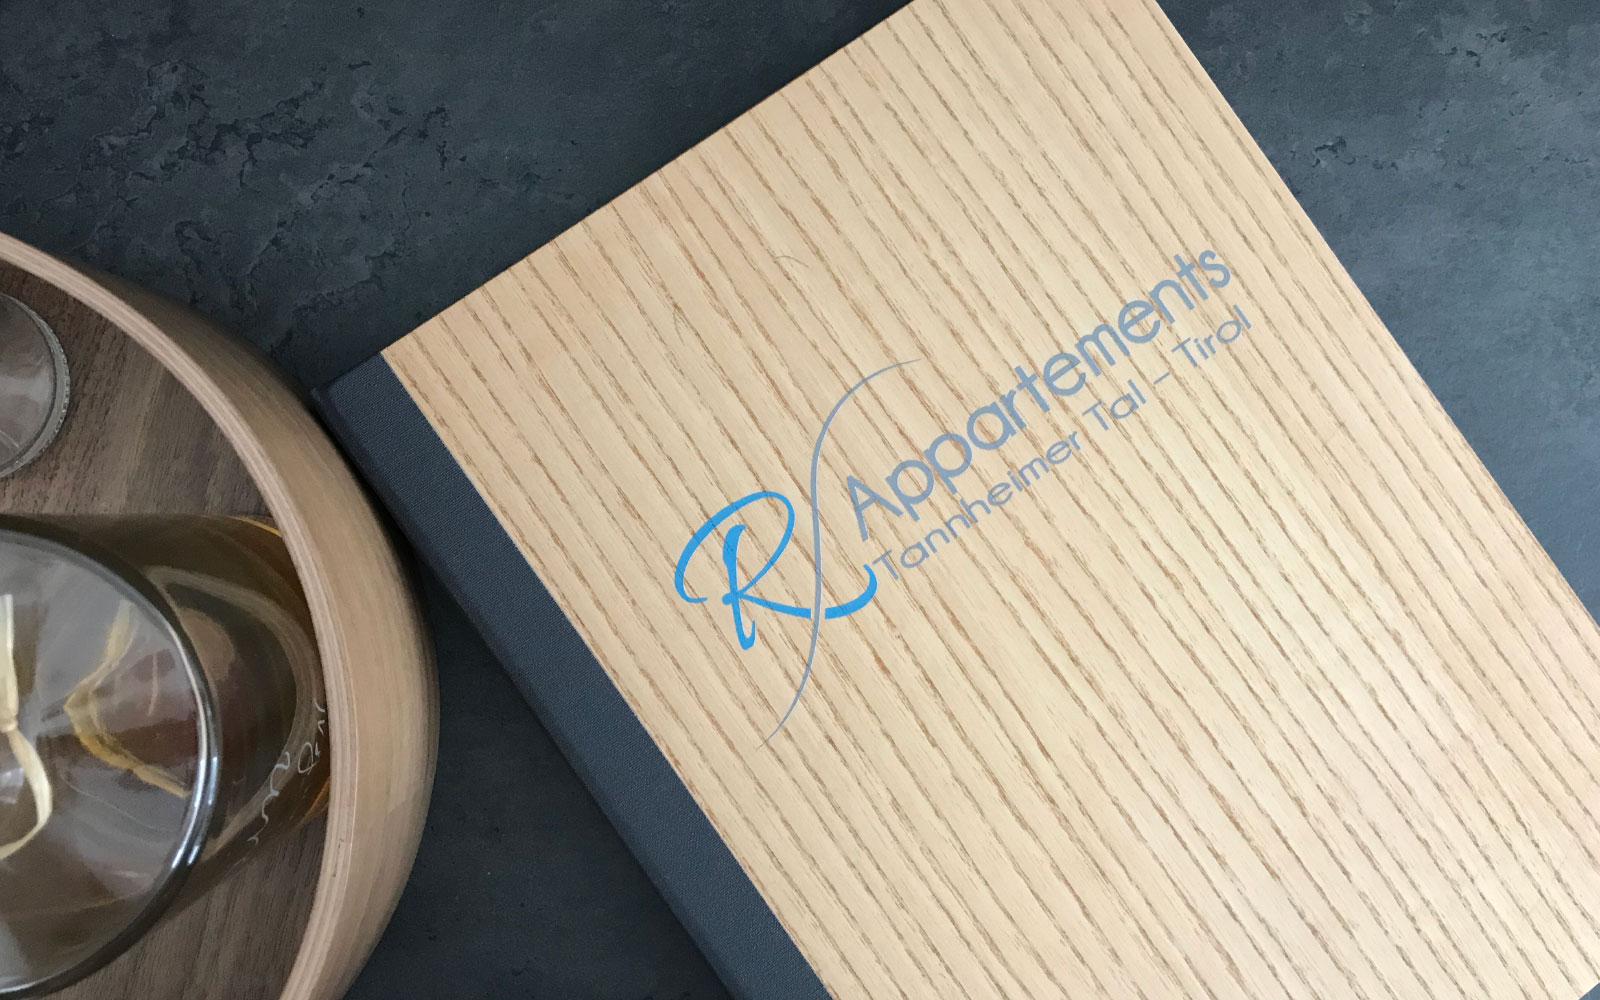 Speisekarte aus Holz Showcase